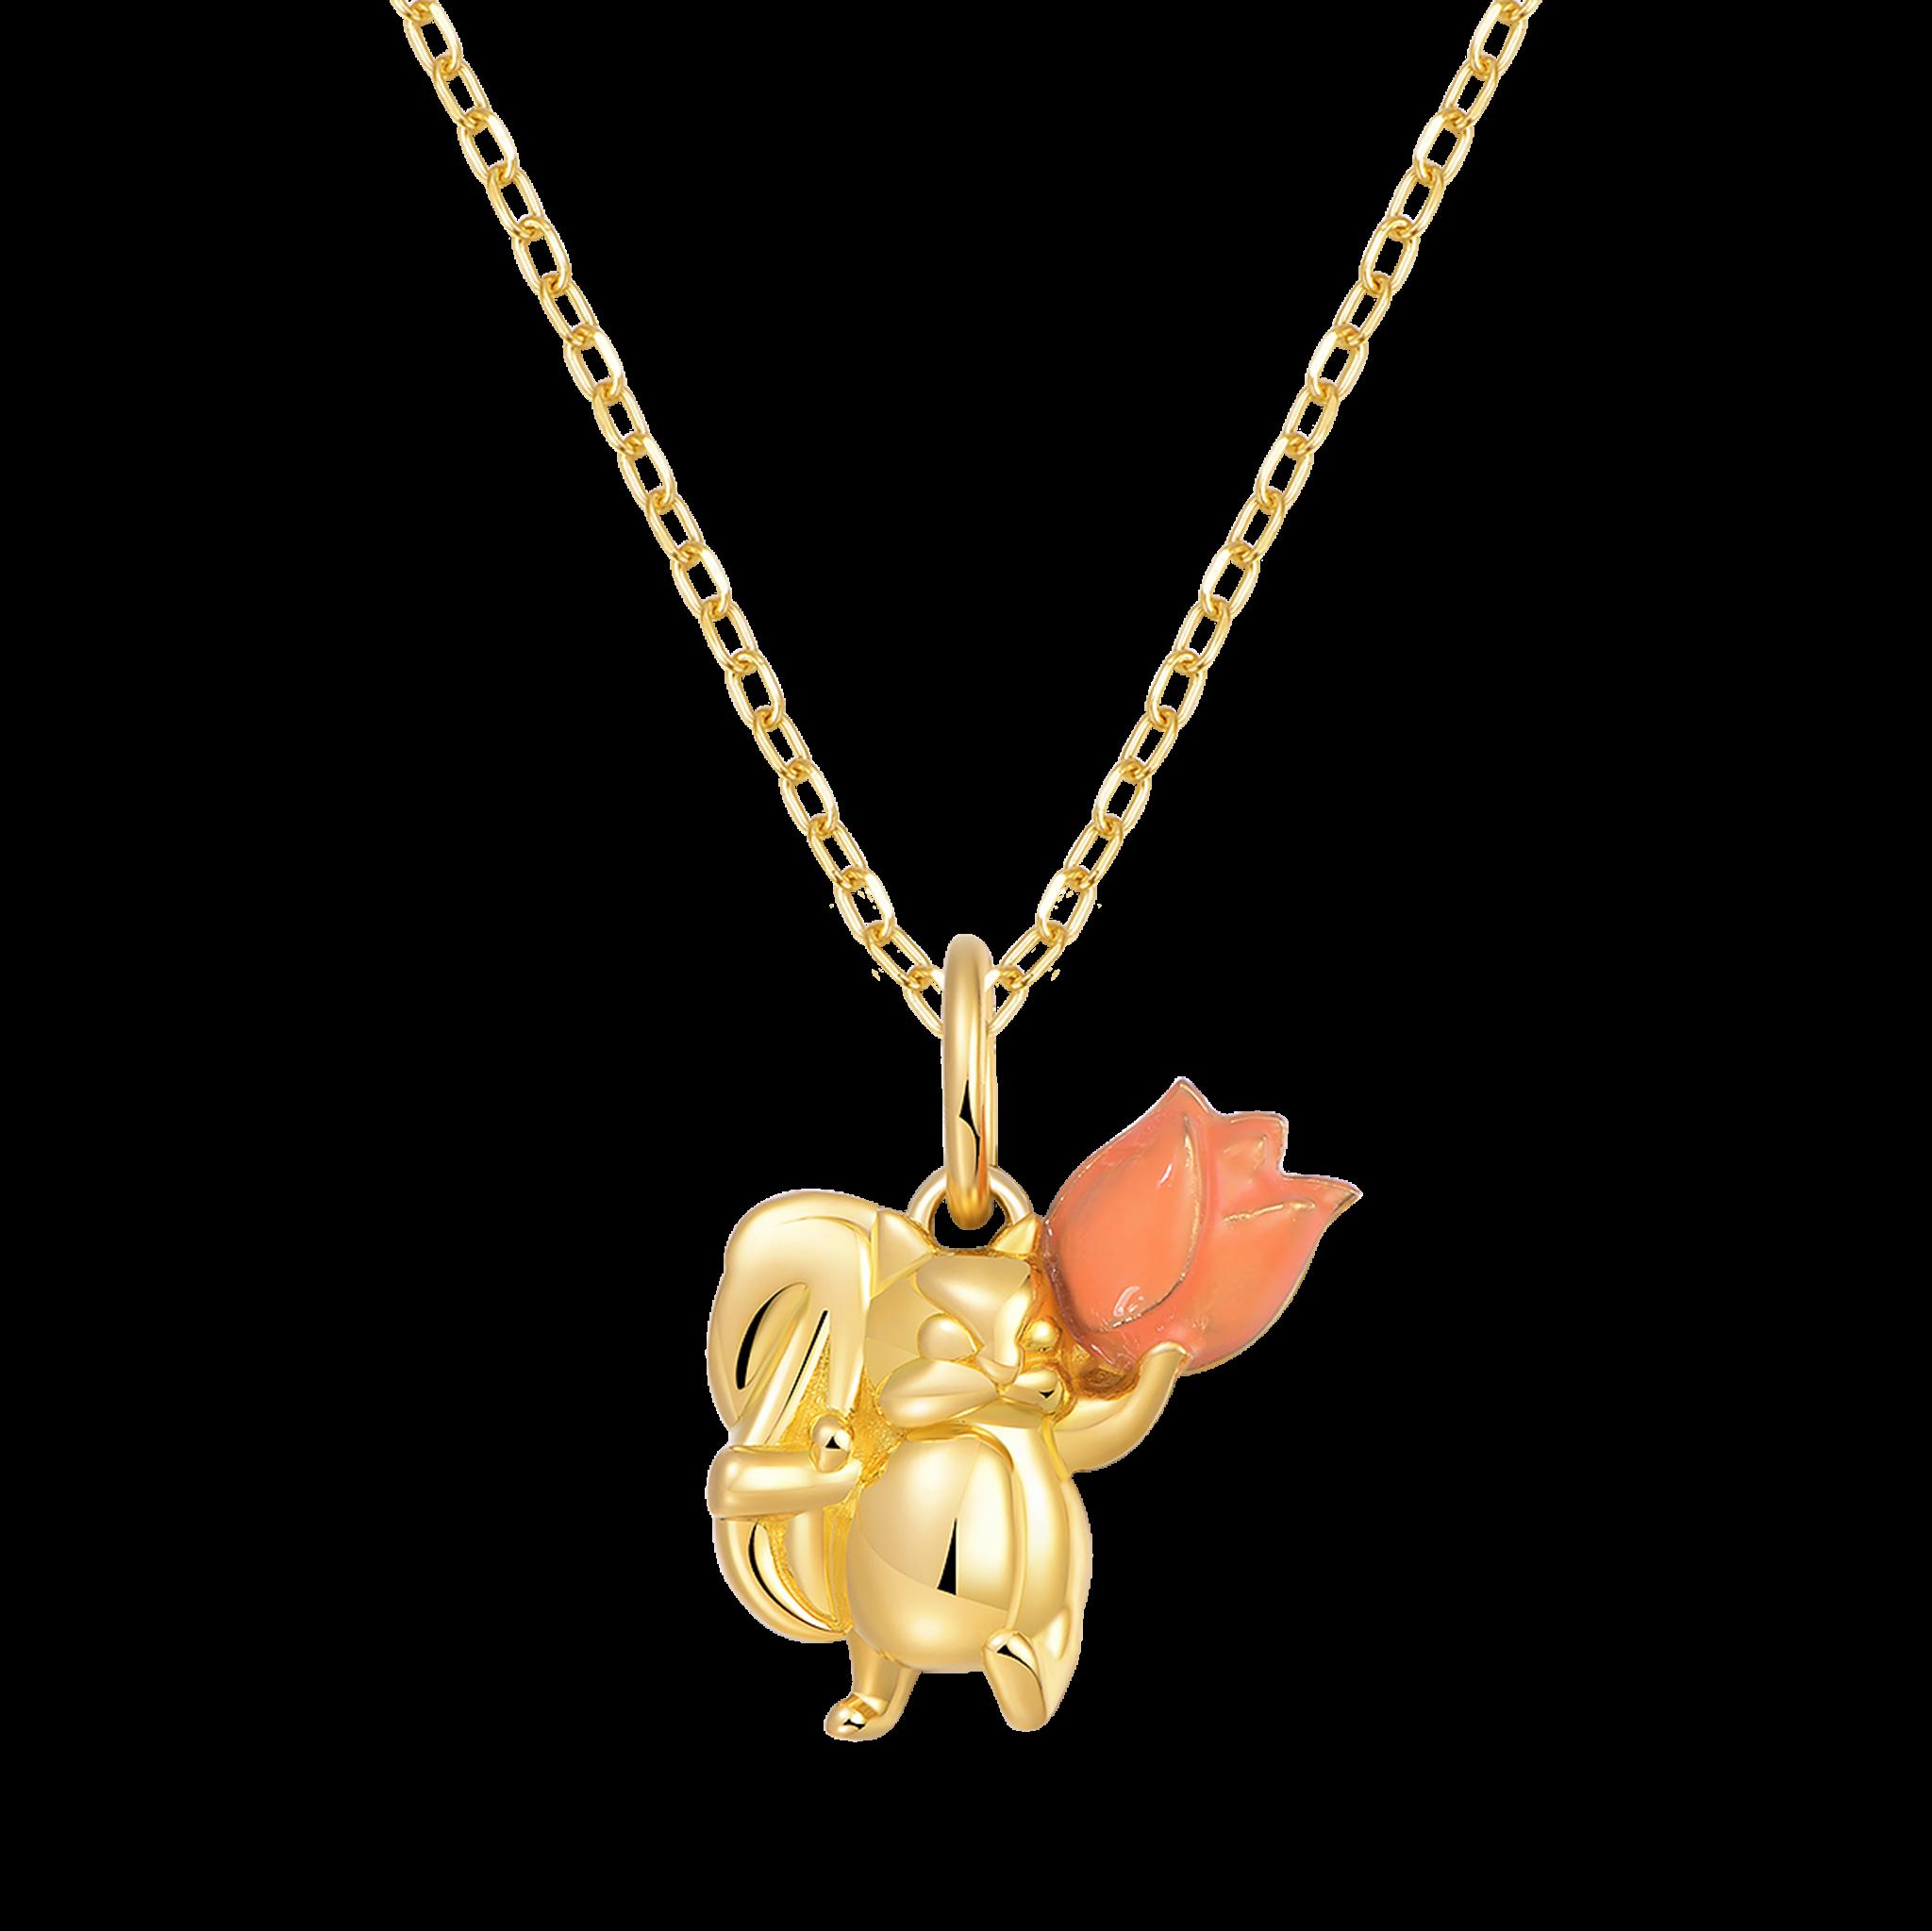 Naughty Little Squirrel Collection 18K珐琅 松鼠吊坠-百合花 2699